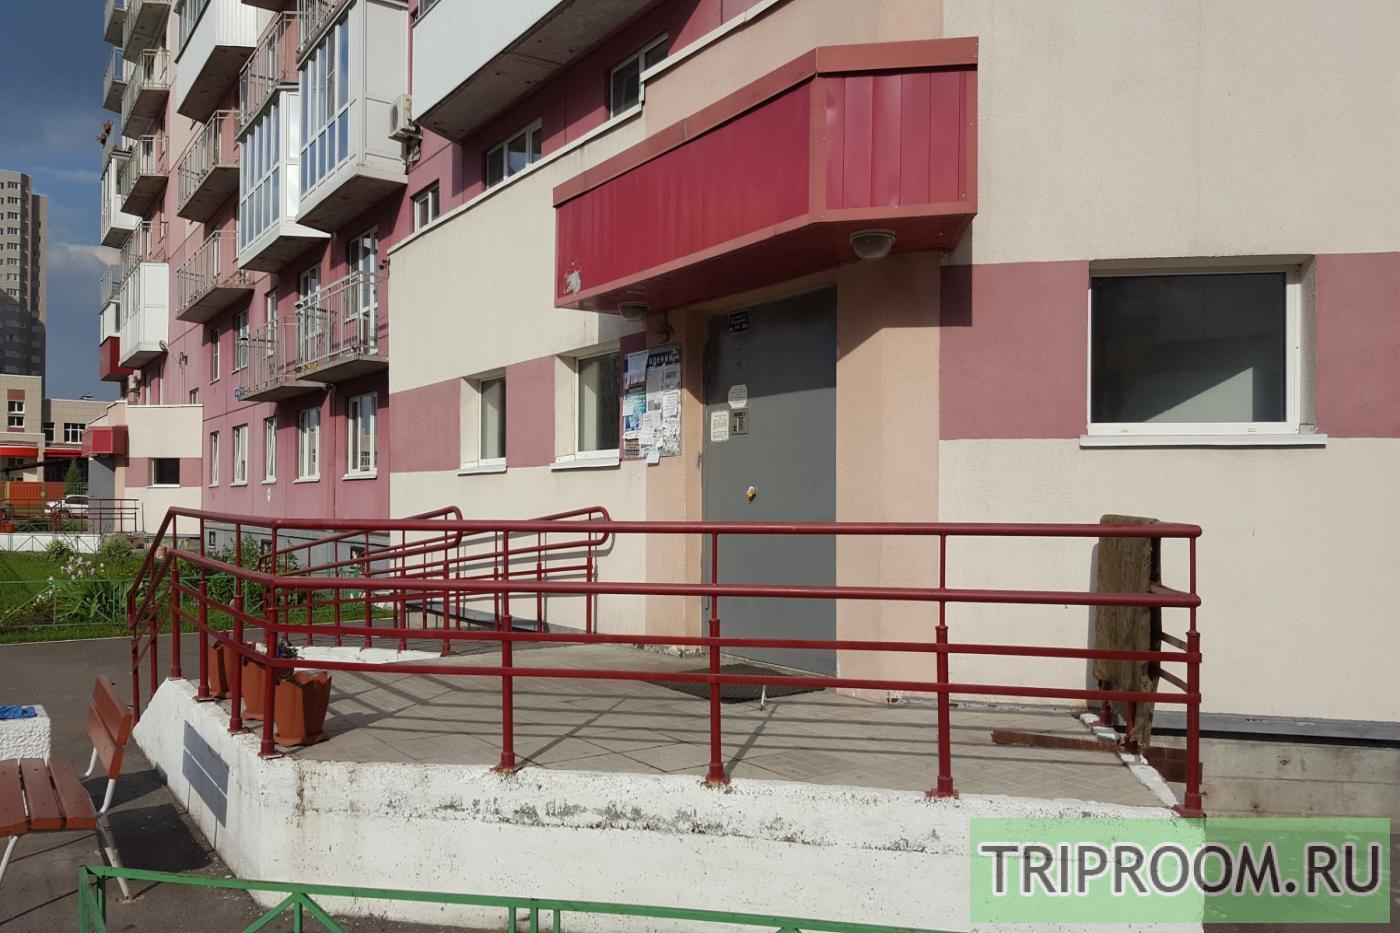 1-комнатная квартира посуточно (вариант № 30838), ул. Ермакова улица, фото № 3